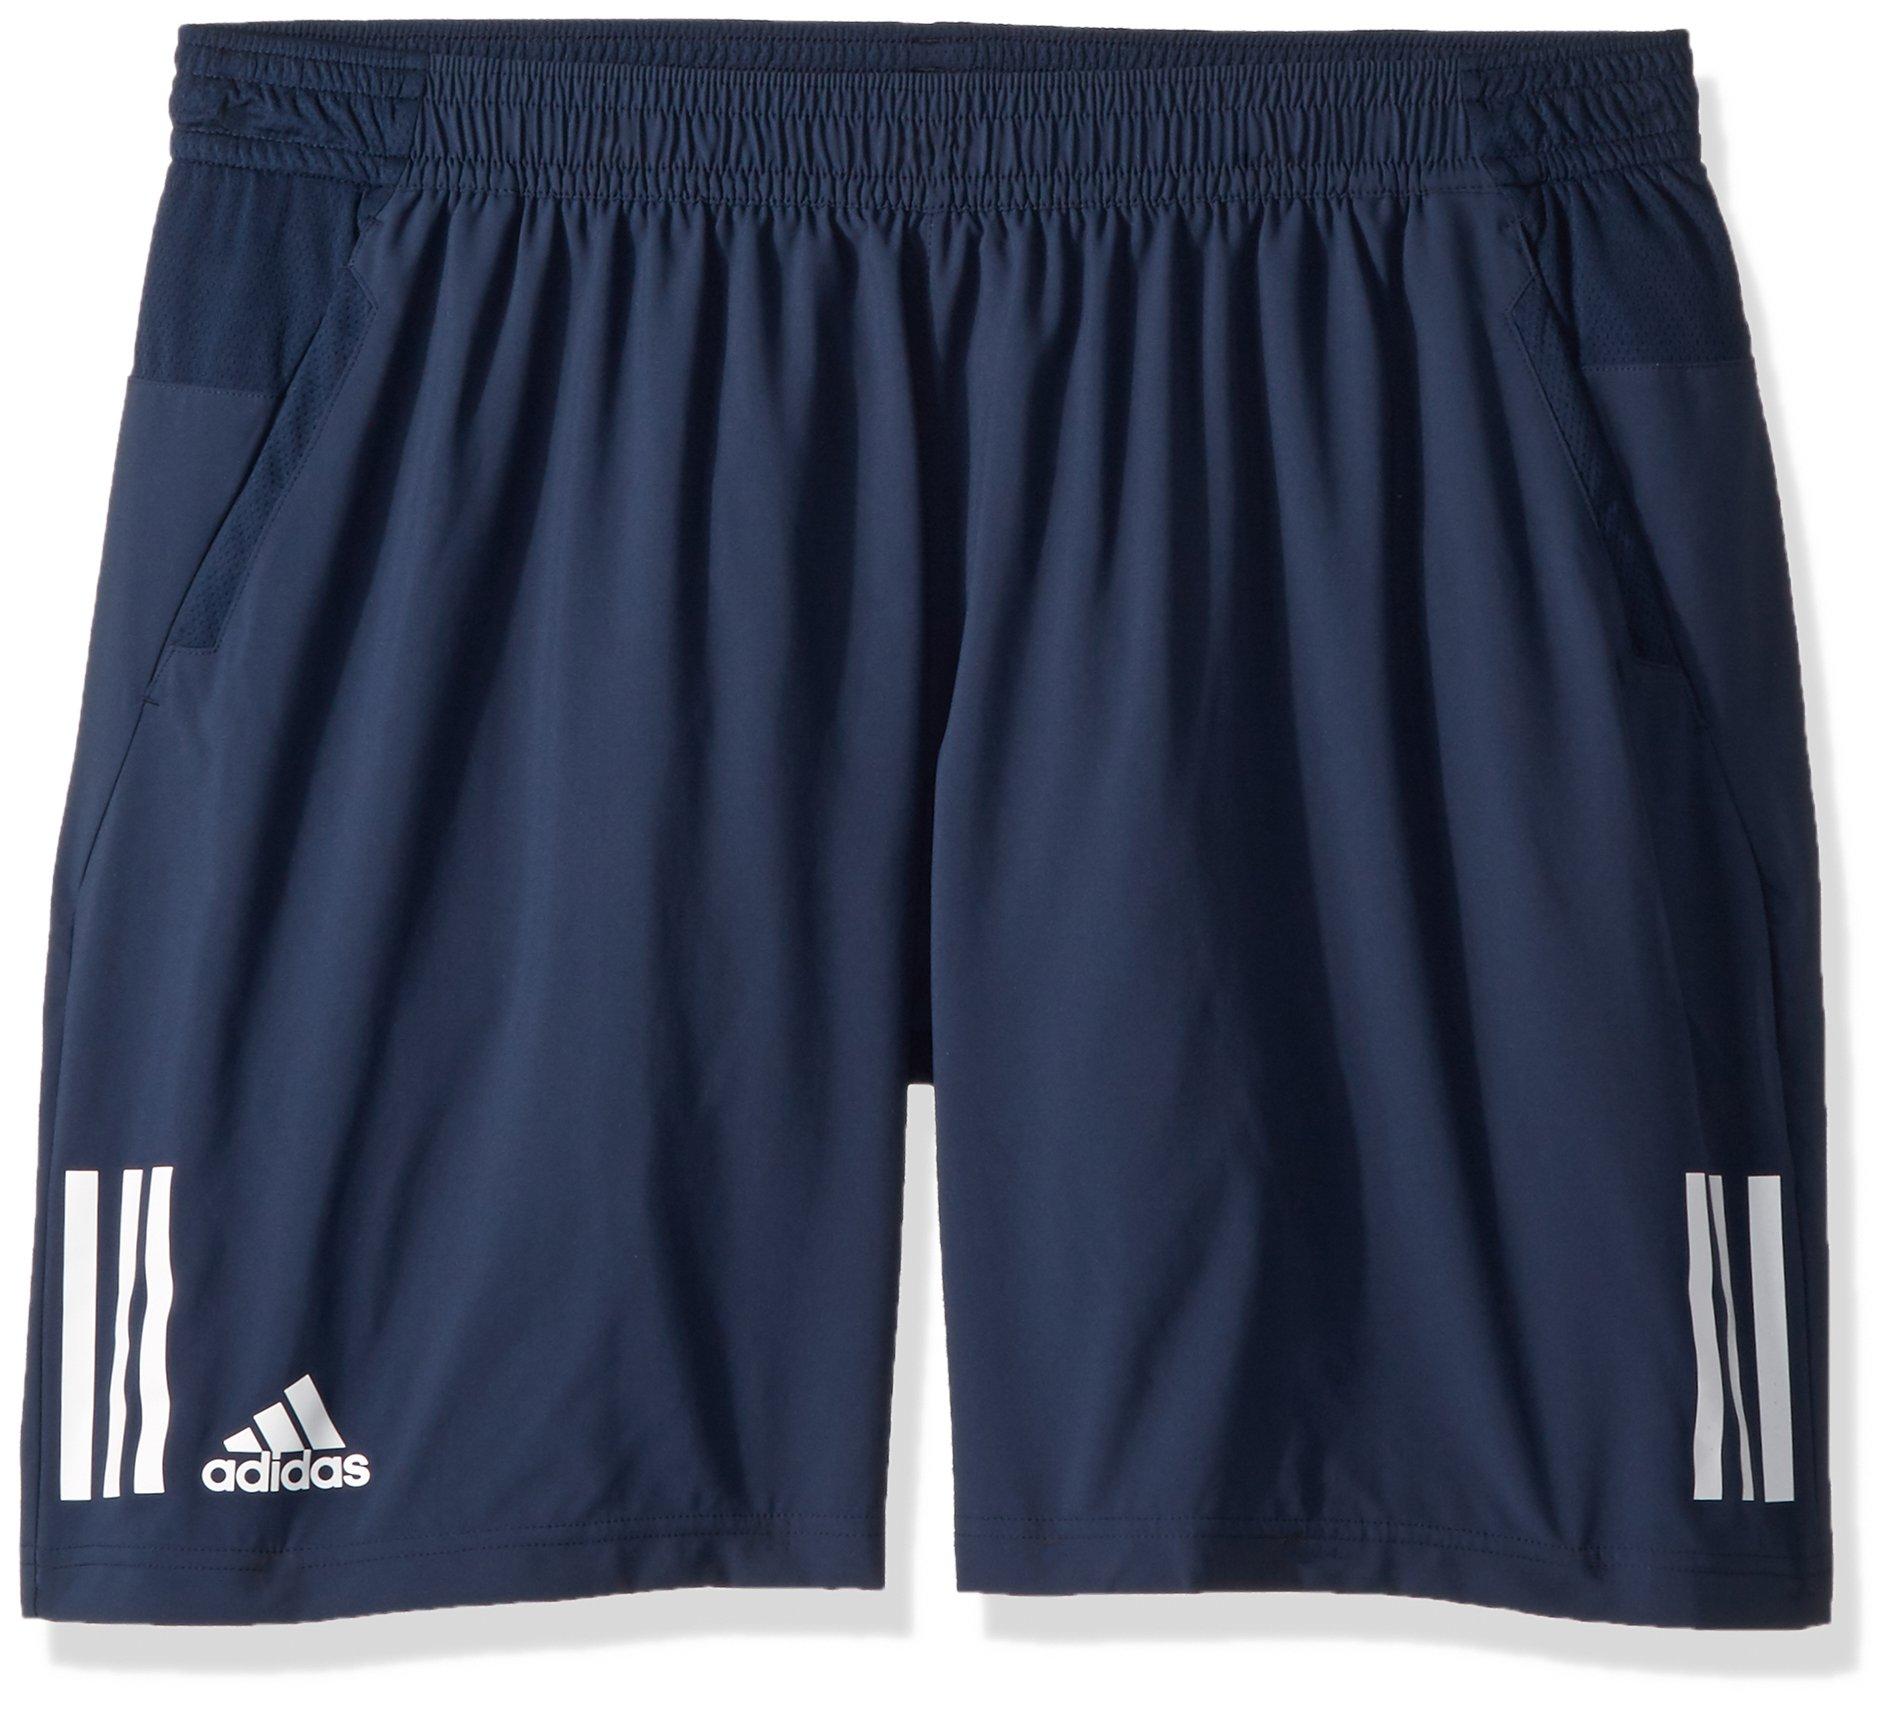 adidas Men's Tennis Club 3 Stripes